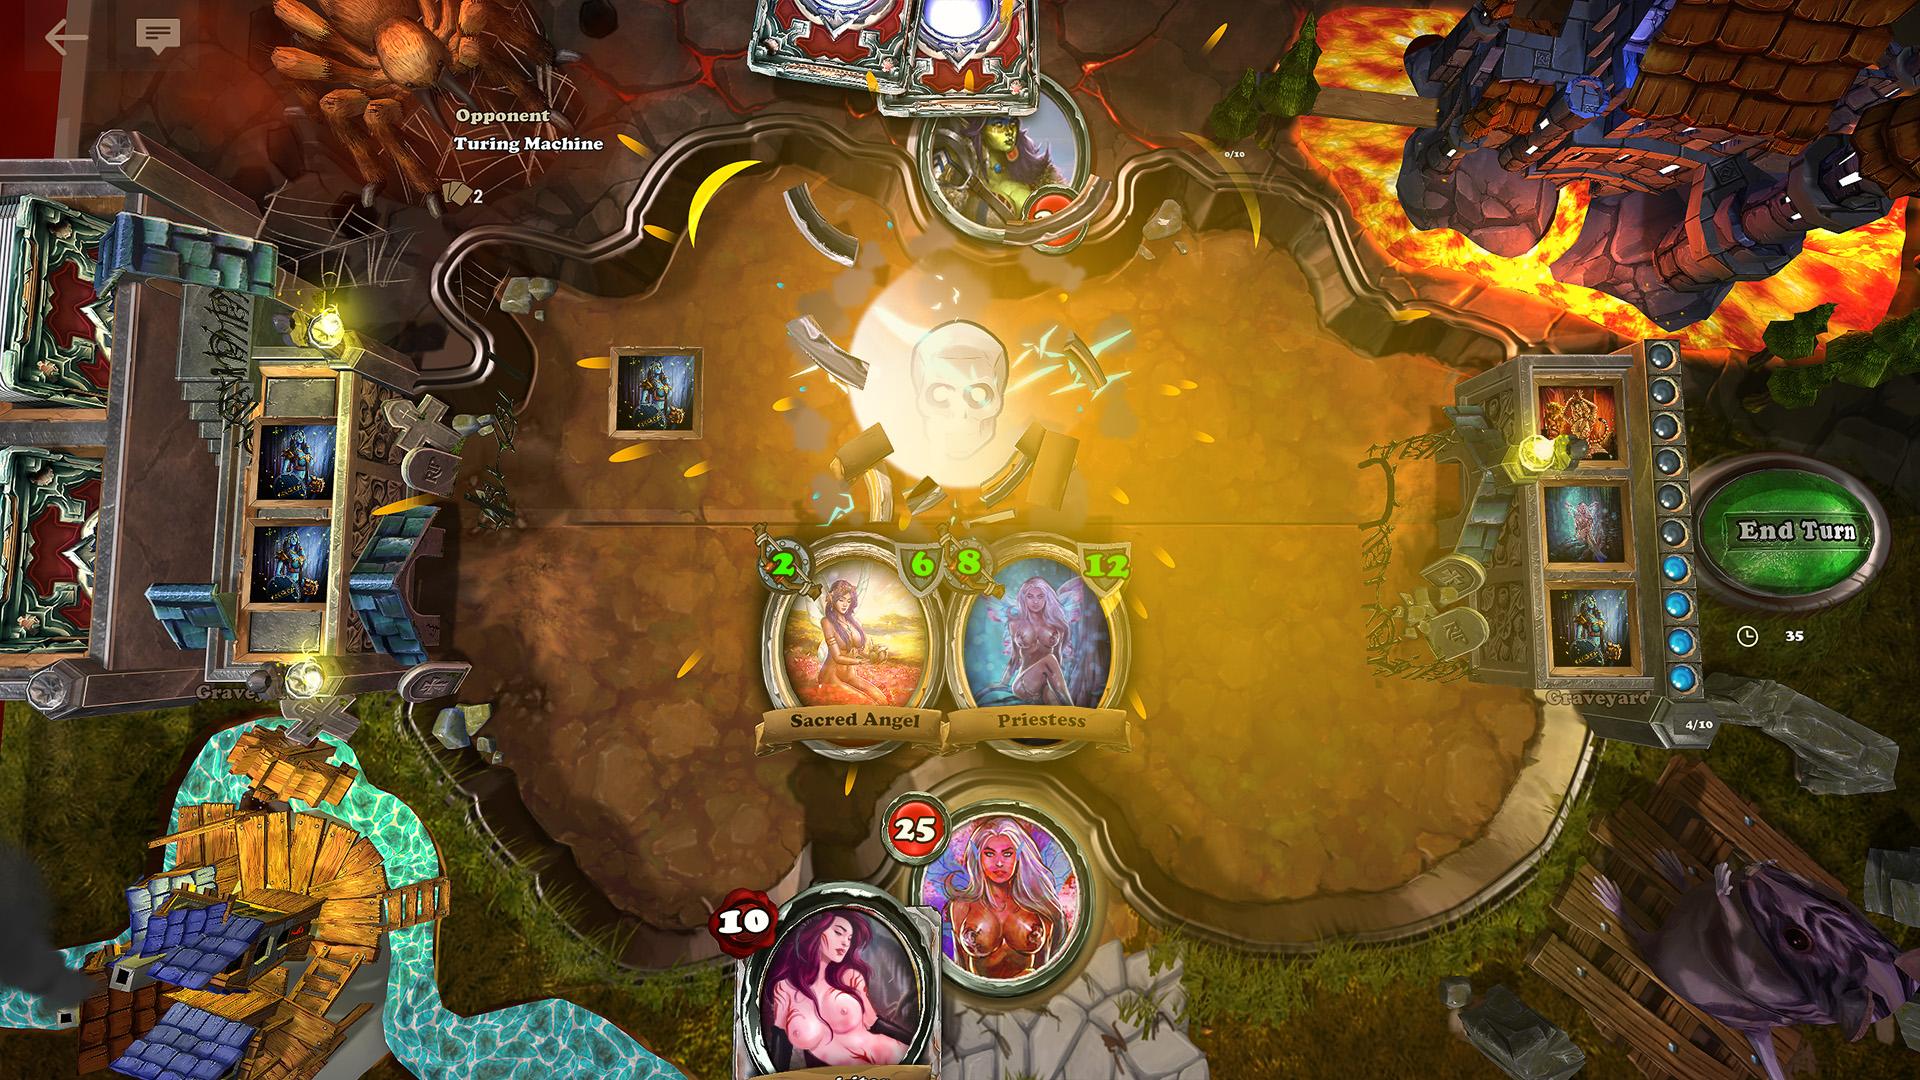 Devious Creatures main game screen